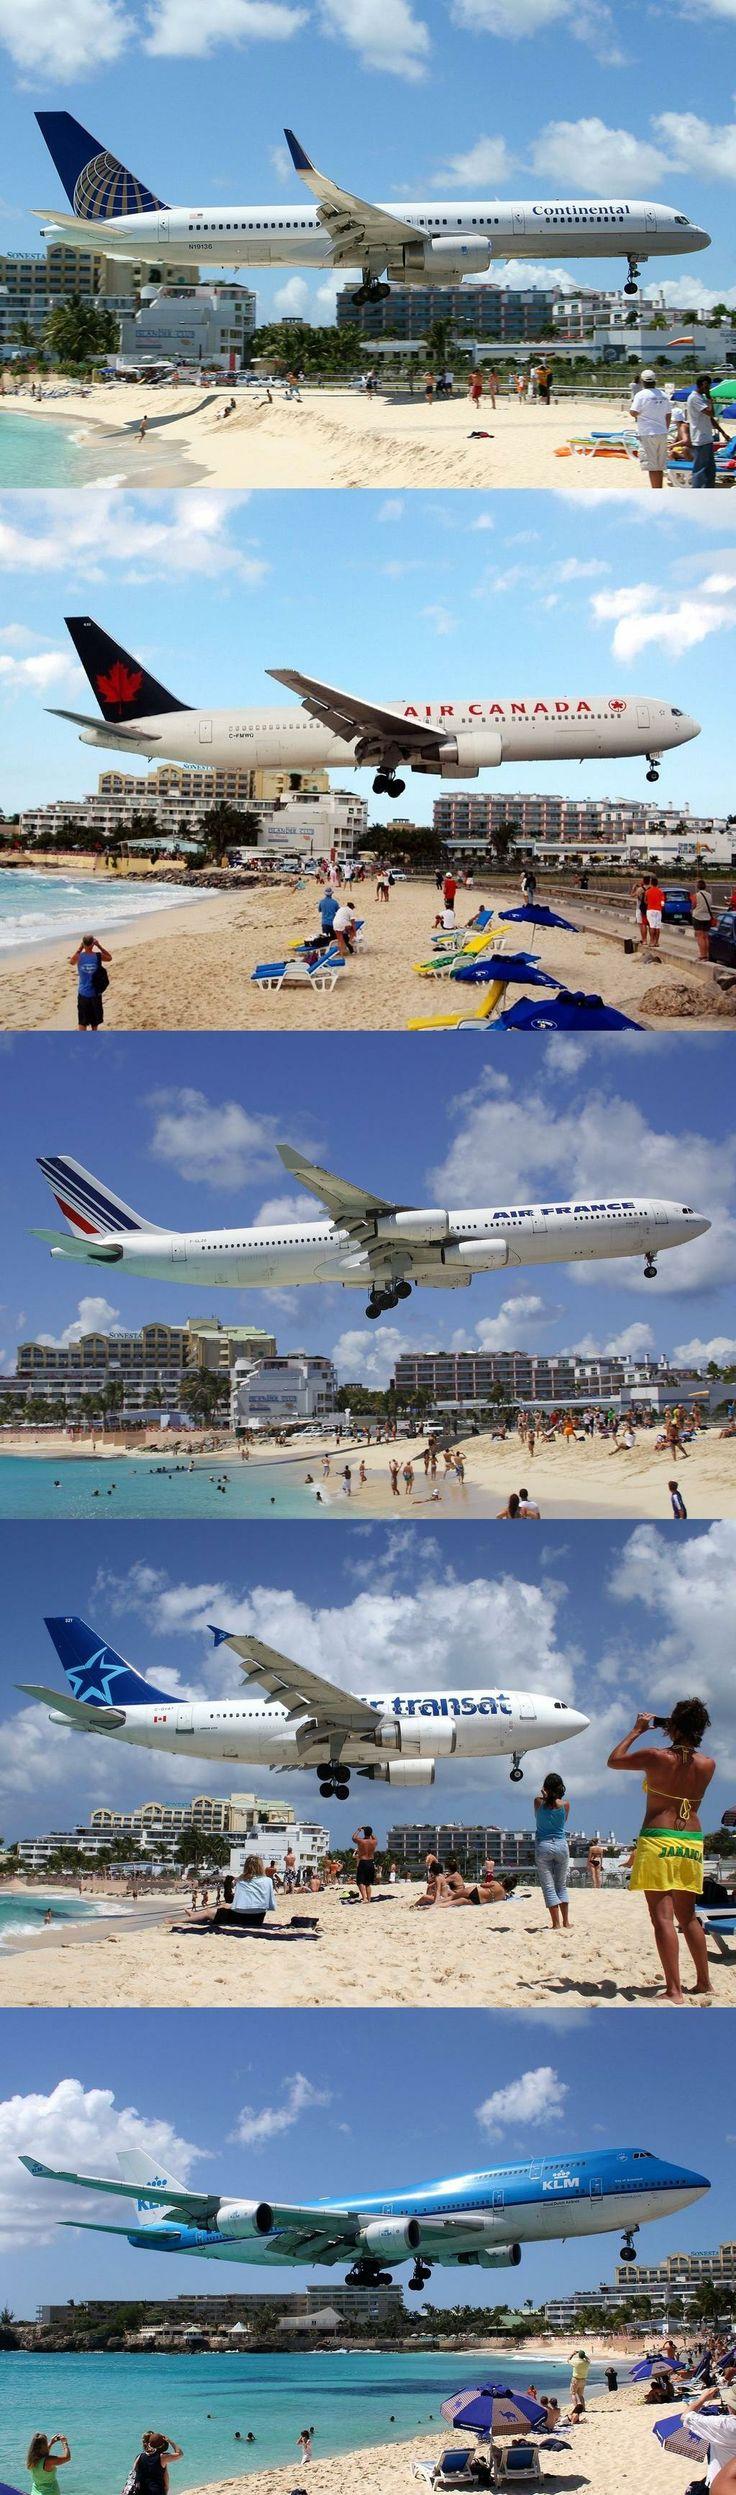 Maho Beach - Saint Maarten, Netherlands Antilles - Airplanes landing at - SXM - Princess Juliana Int'l Airport